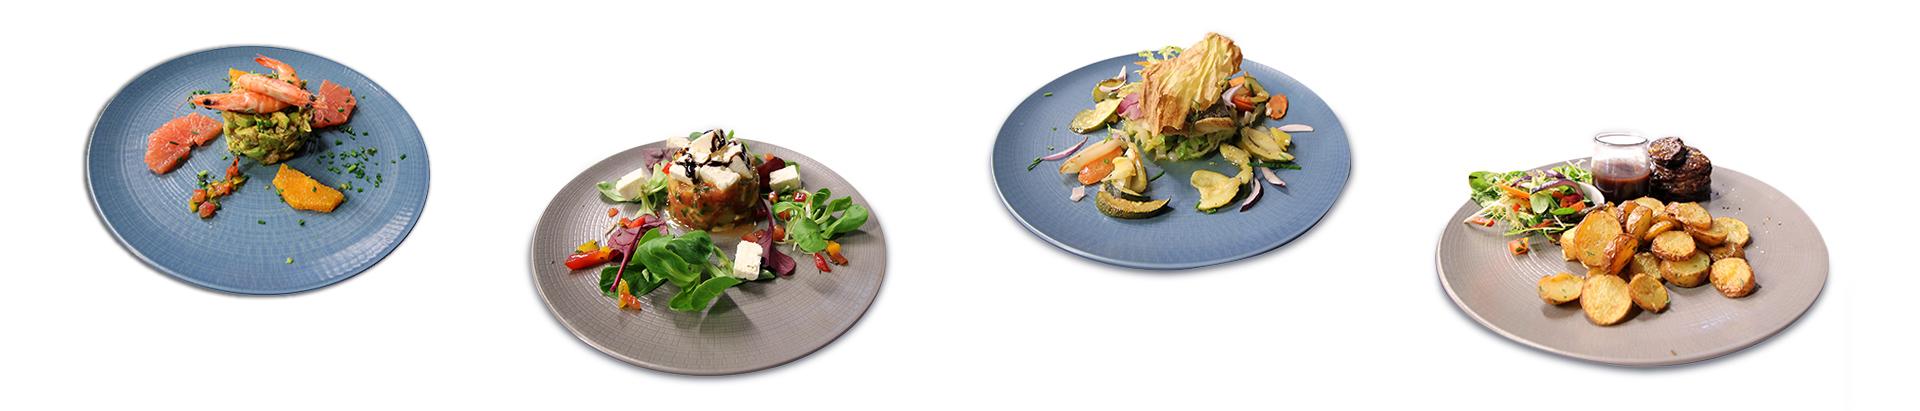 Les plats - Restaurant Le Chiopot